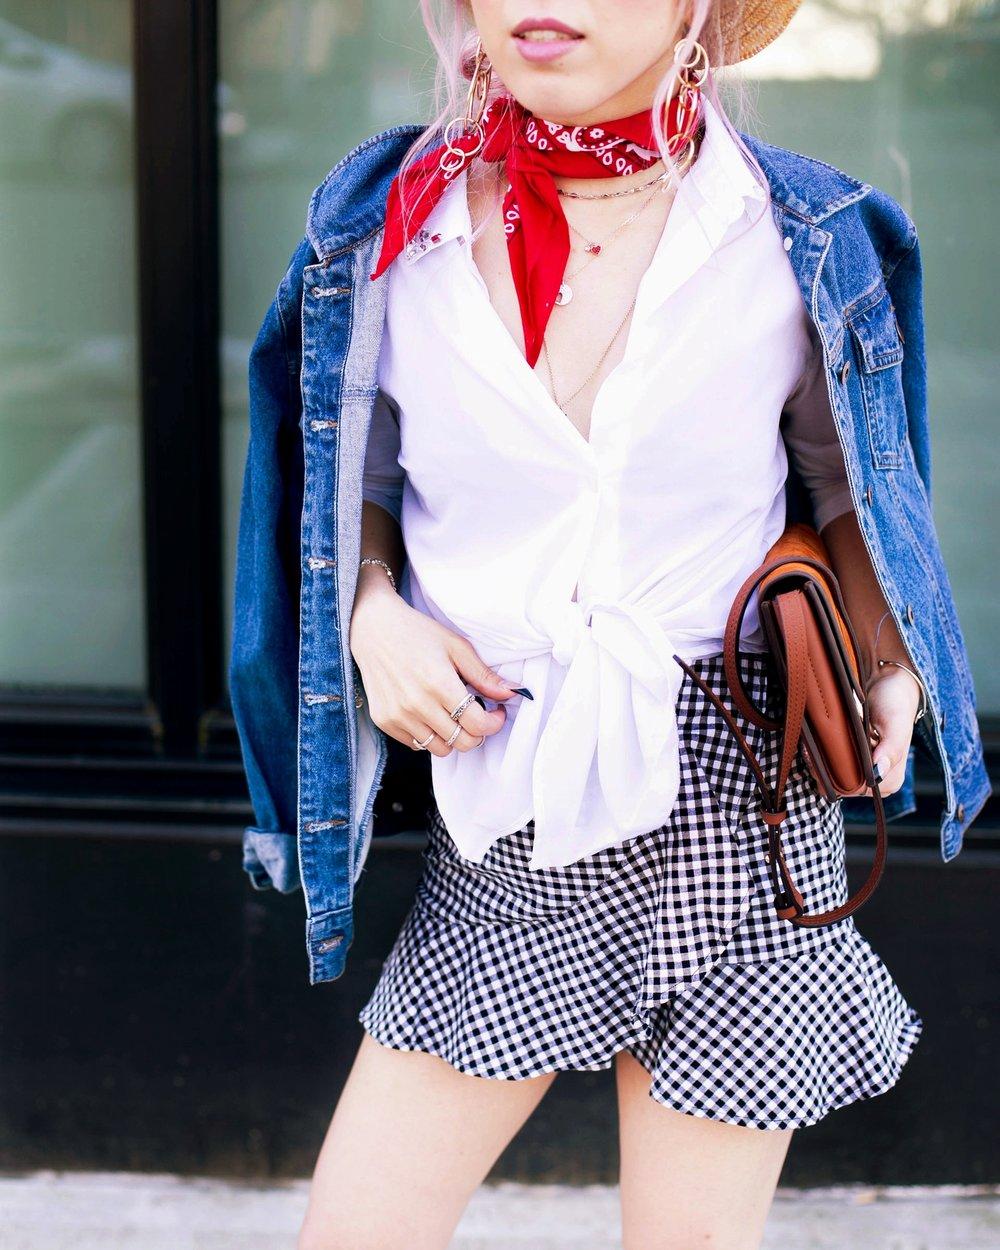 Forever 21 Denim jacket_H&M Straw hat_Urban Outfitter Red bandana_kohls kohl's button up shirt_ZARA statement earrings_H&M gingham mini skirt_Chloe Faye mini bag_ALDO Embroidered Mules_Aikas Love Closet_Seattle Fashion style logger_petite fashion 10